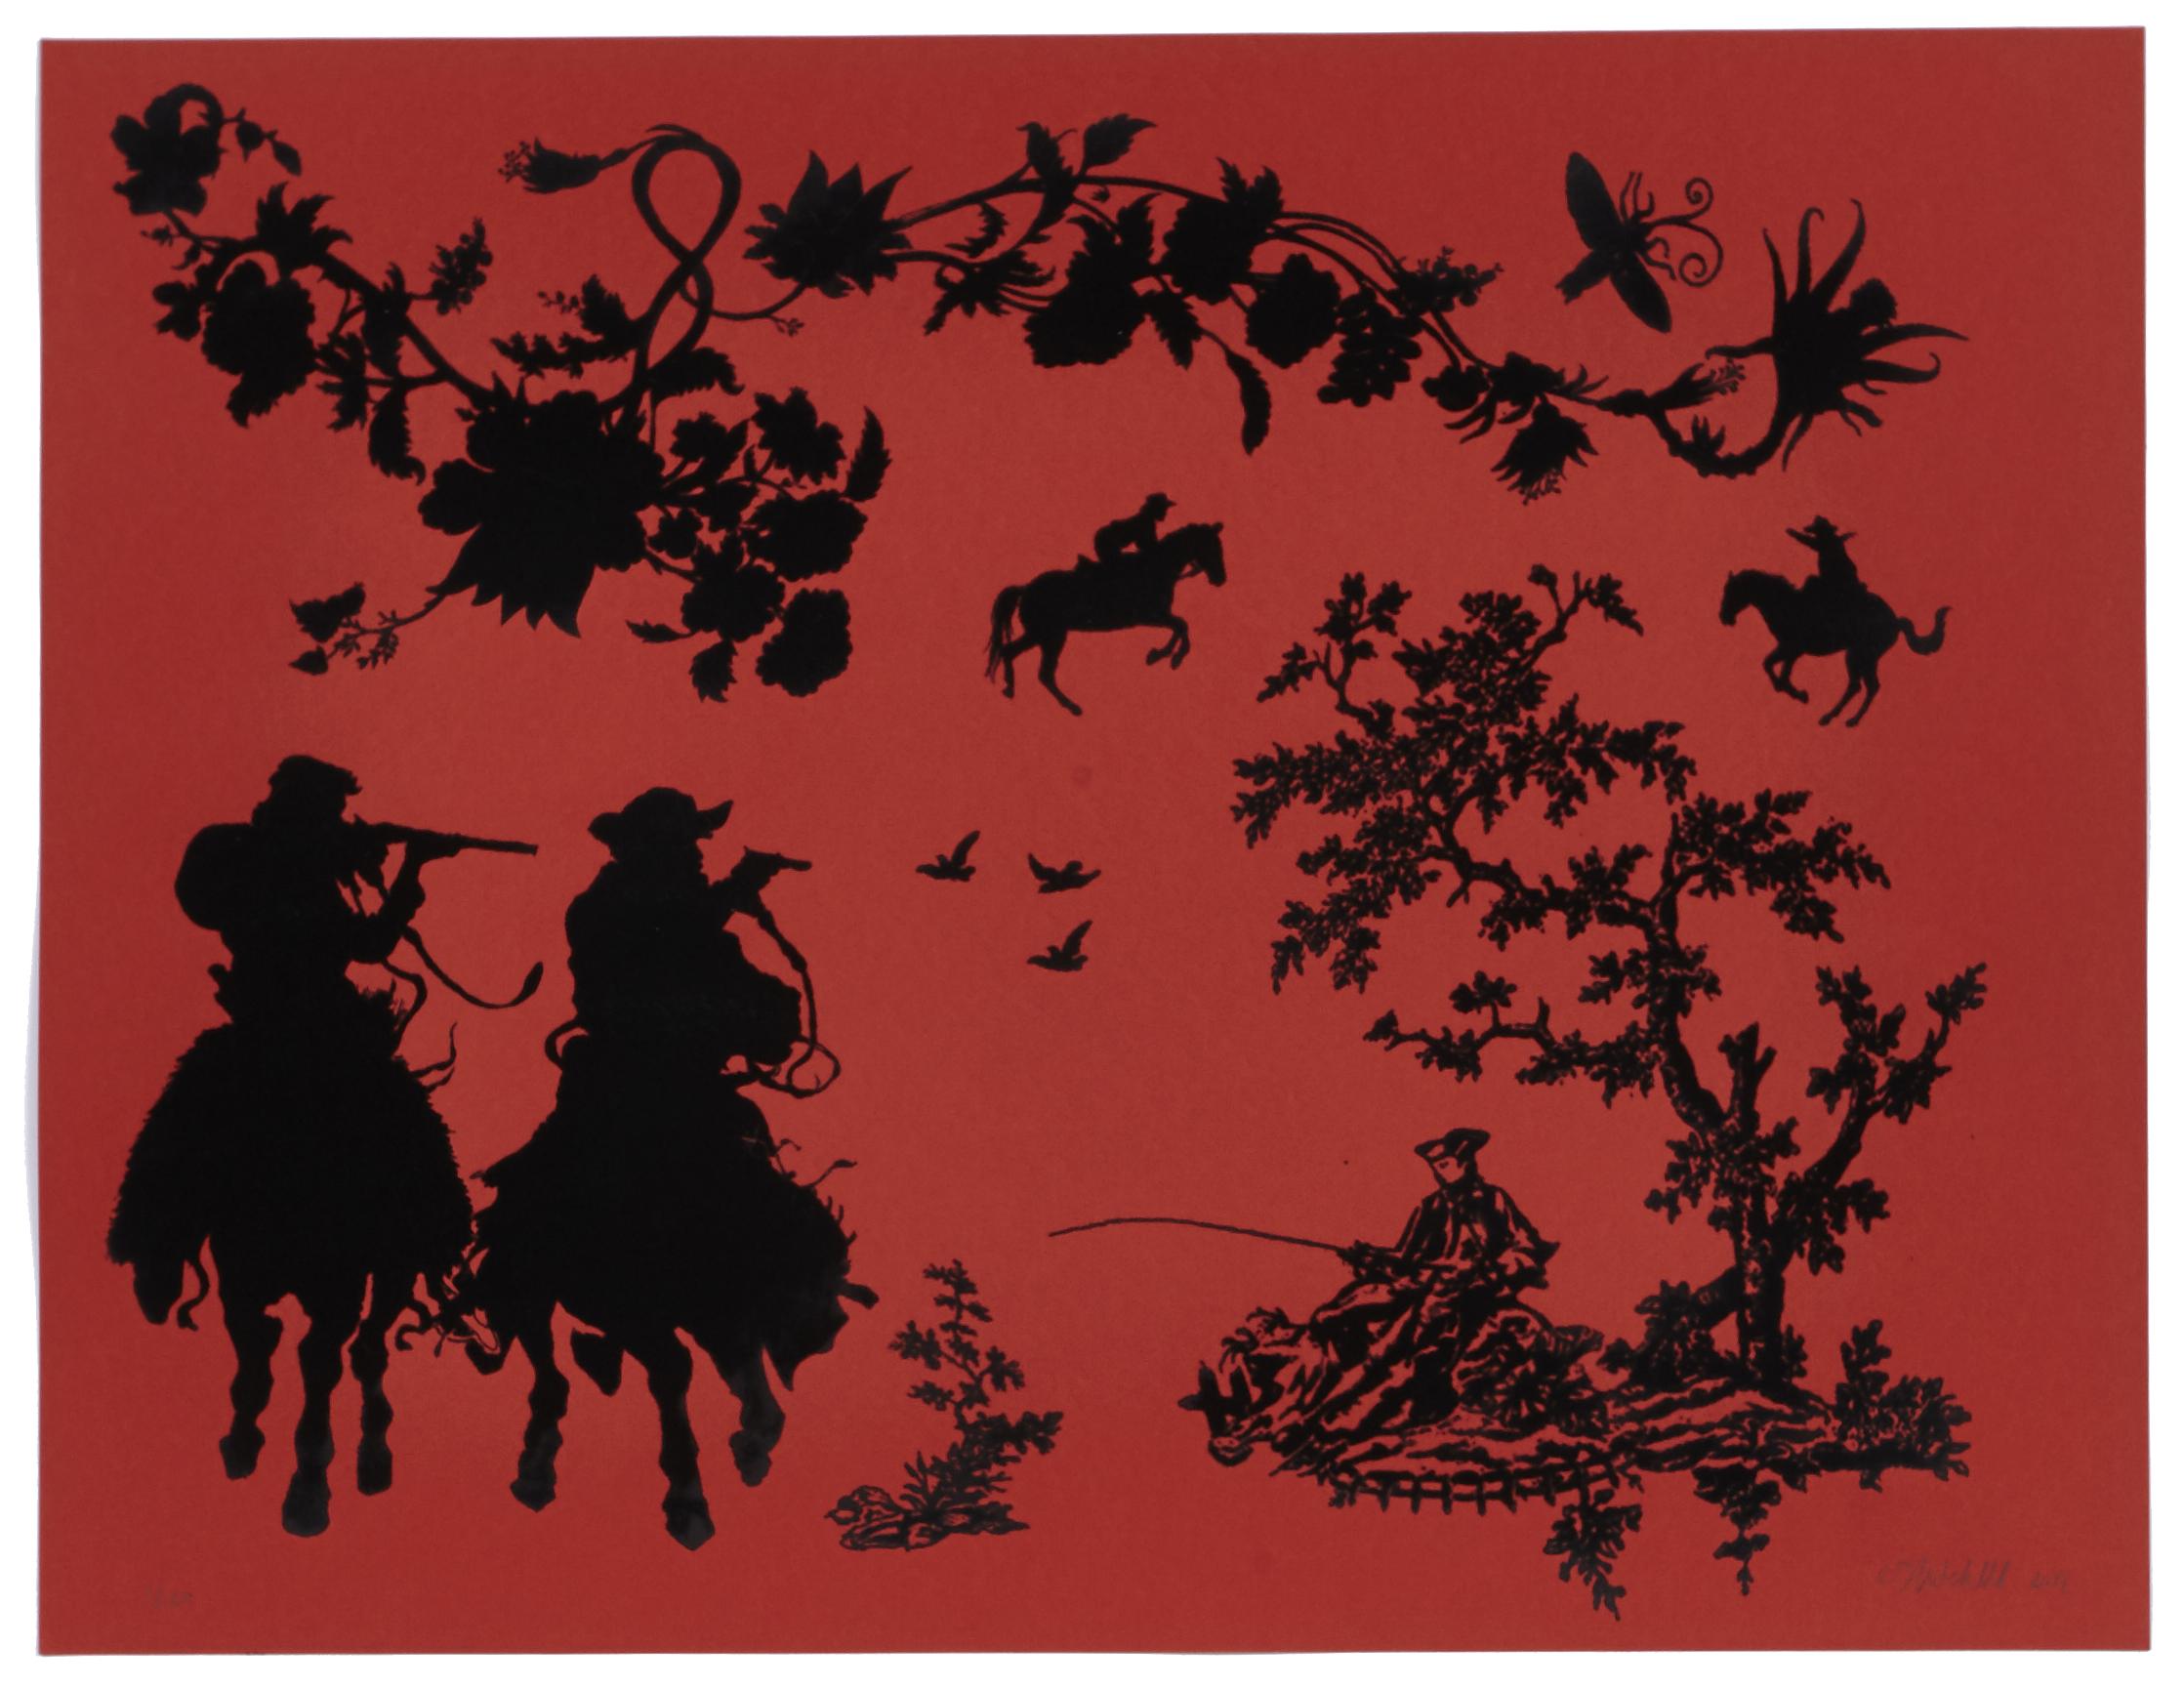 Untitled 5    2012 | 50 x 56 cm | Silkscreen | 20 prints